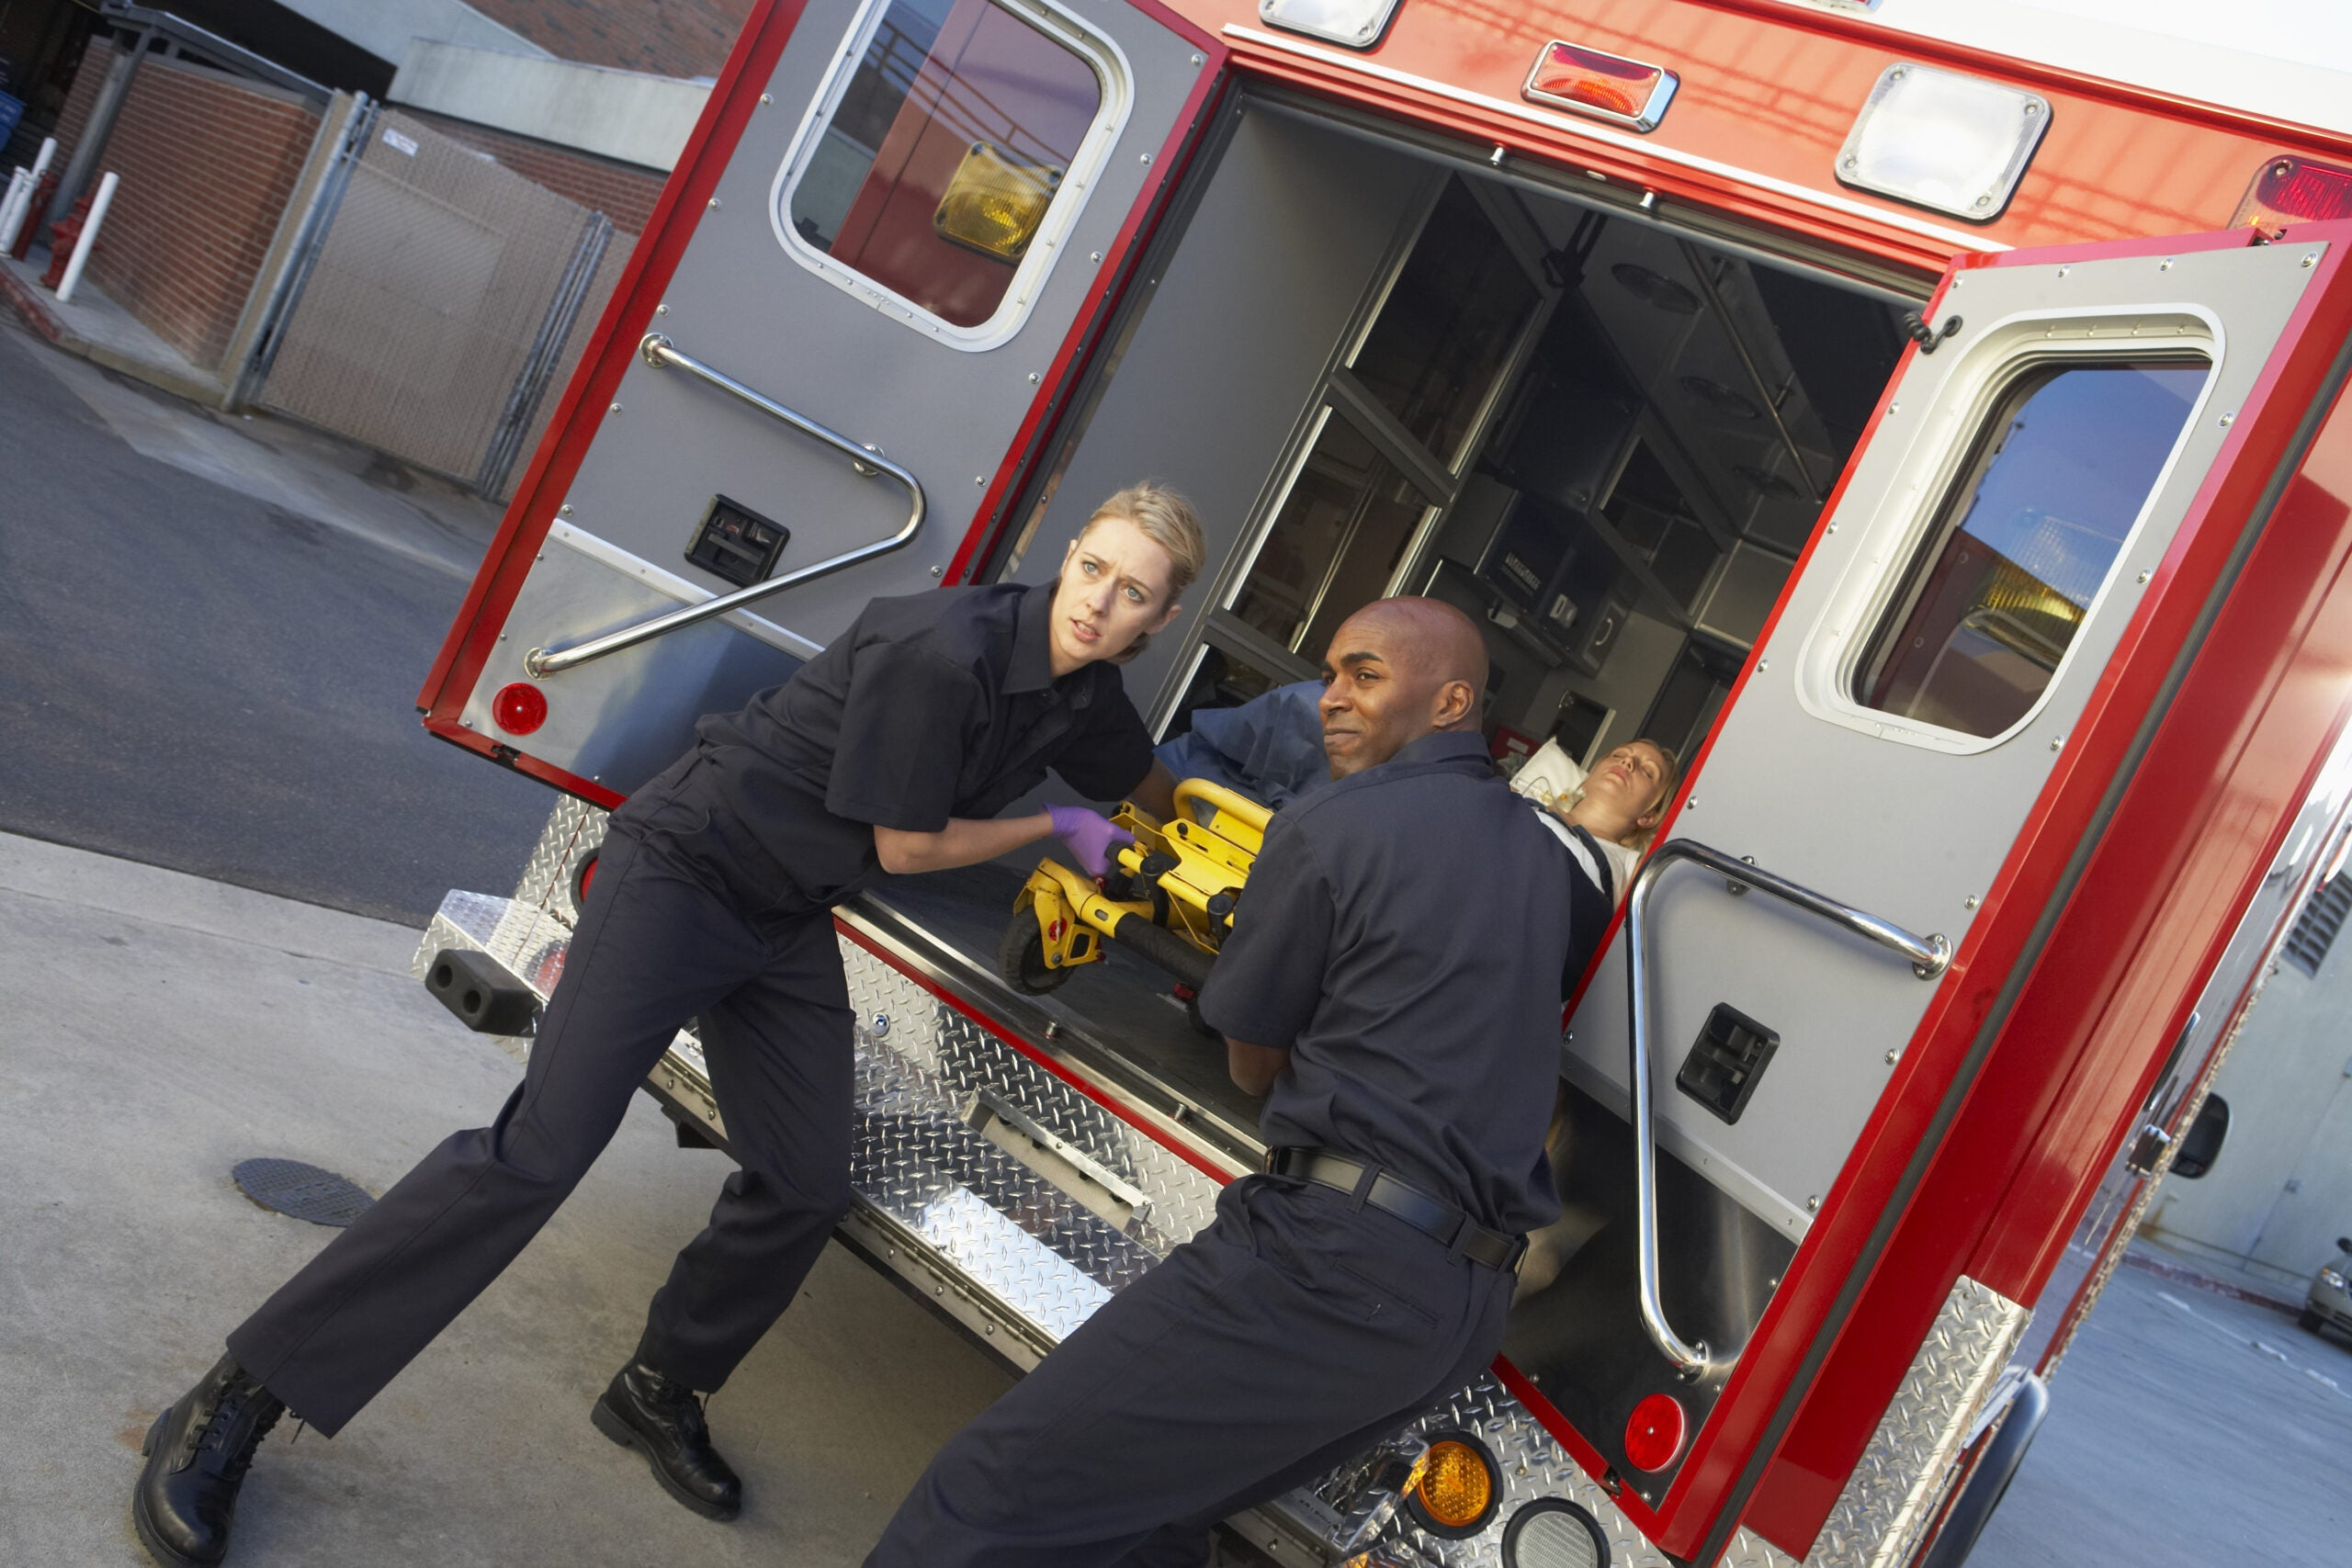 two paramedics prepare to take someone out of an ambulance